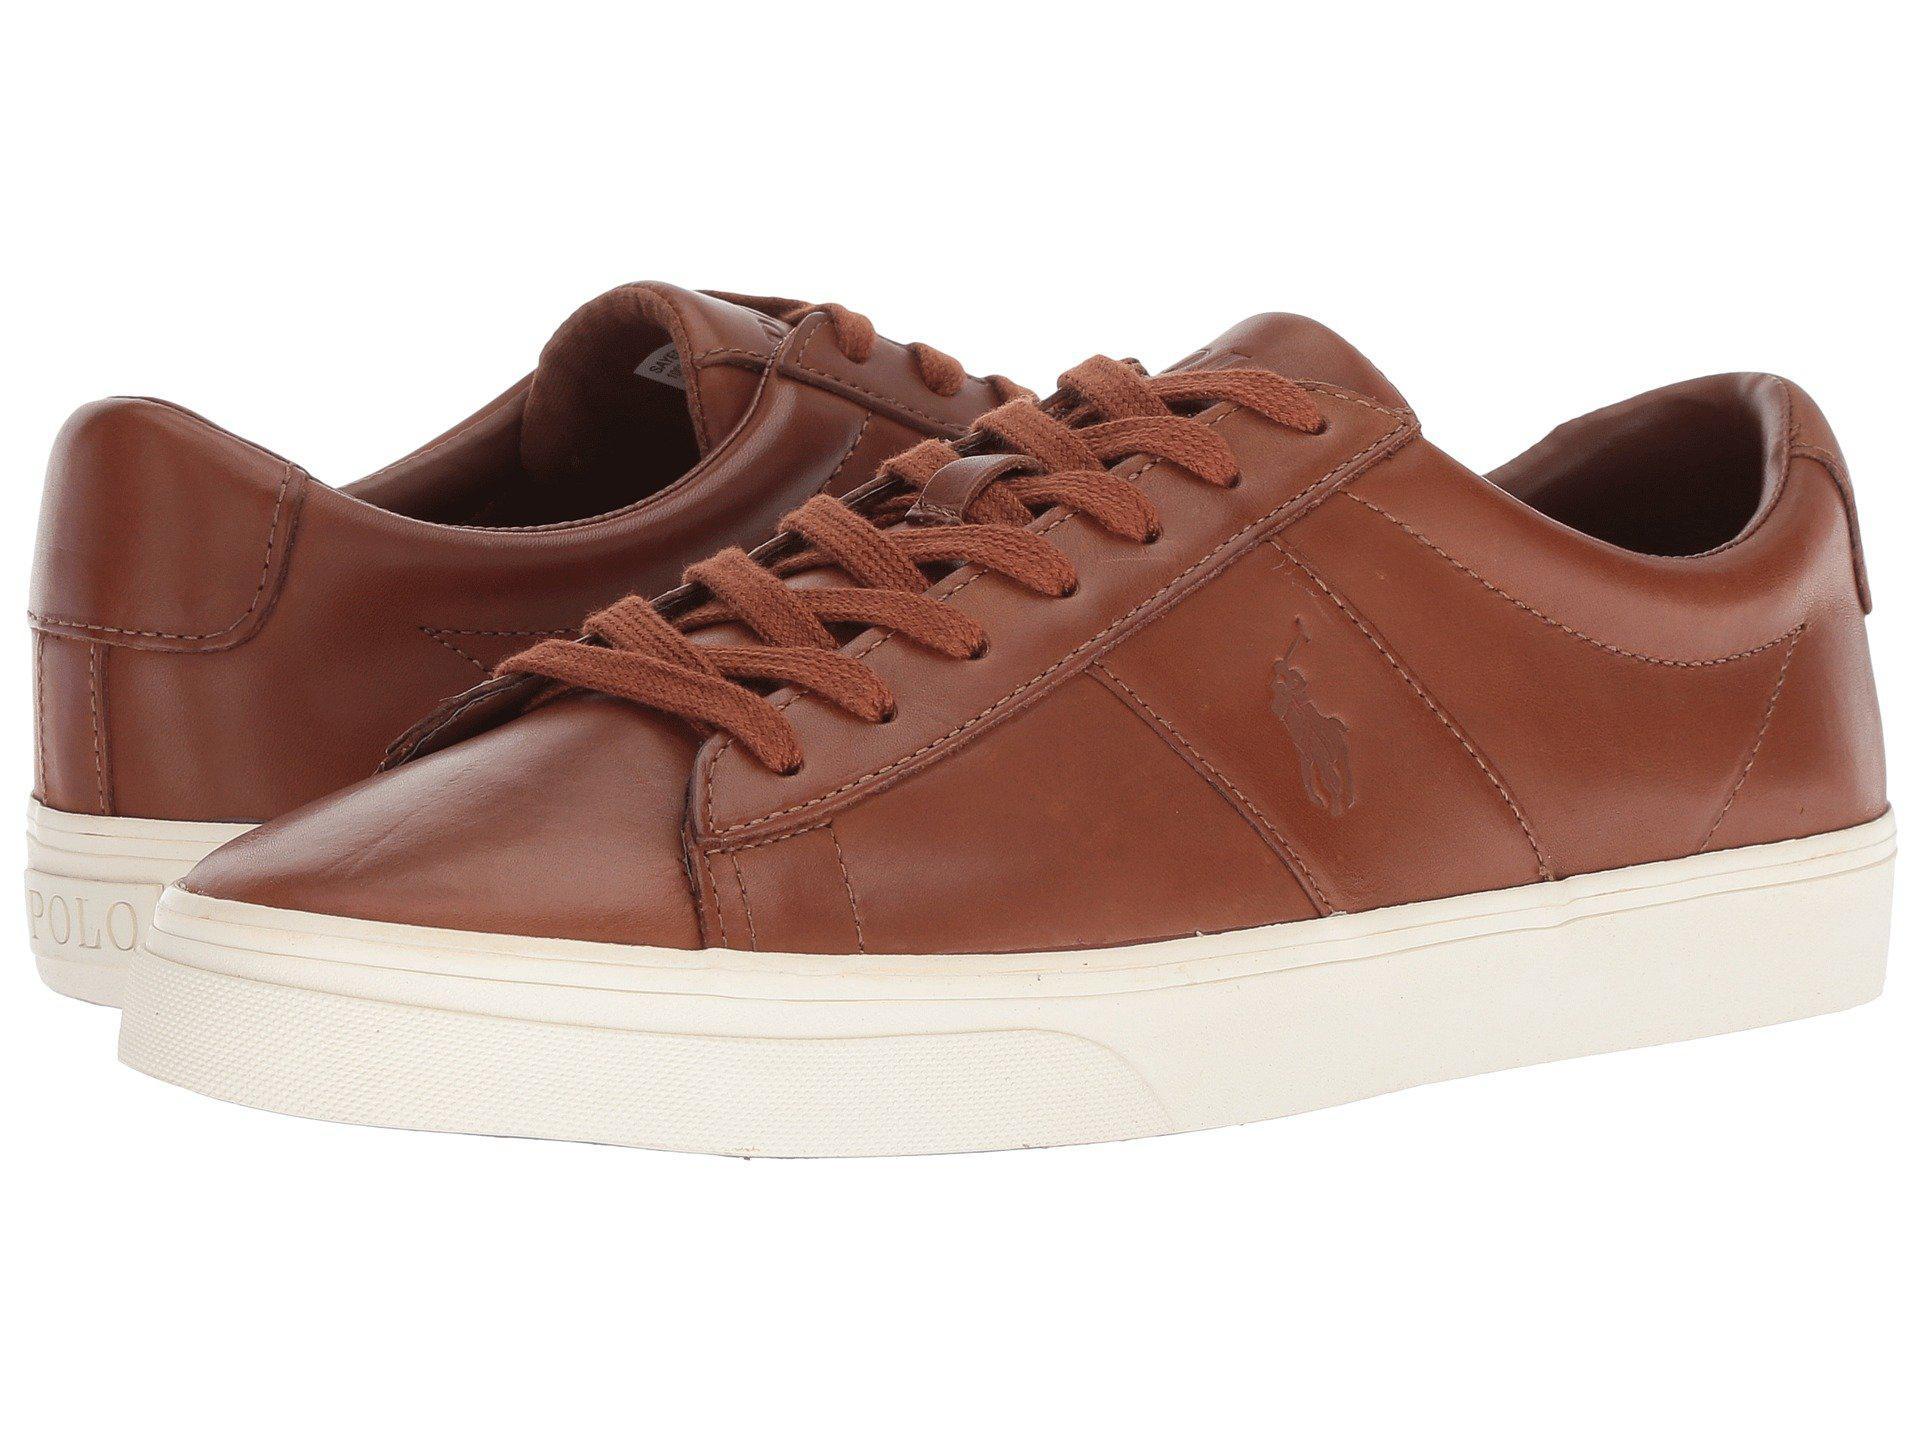 b93f2e84c0f Lyst - Polo Ralph Lauren Sayer (dark Brown) Men s Shoes in Brown for Men